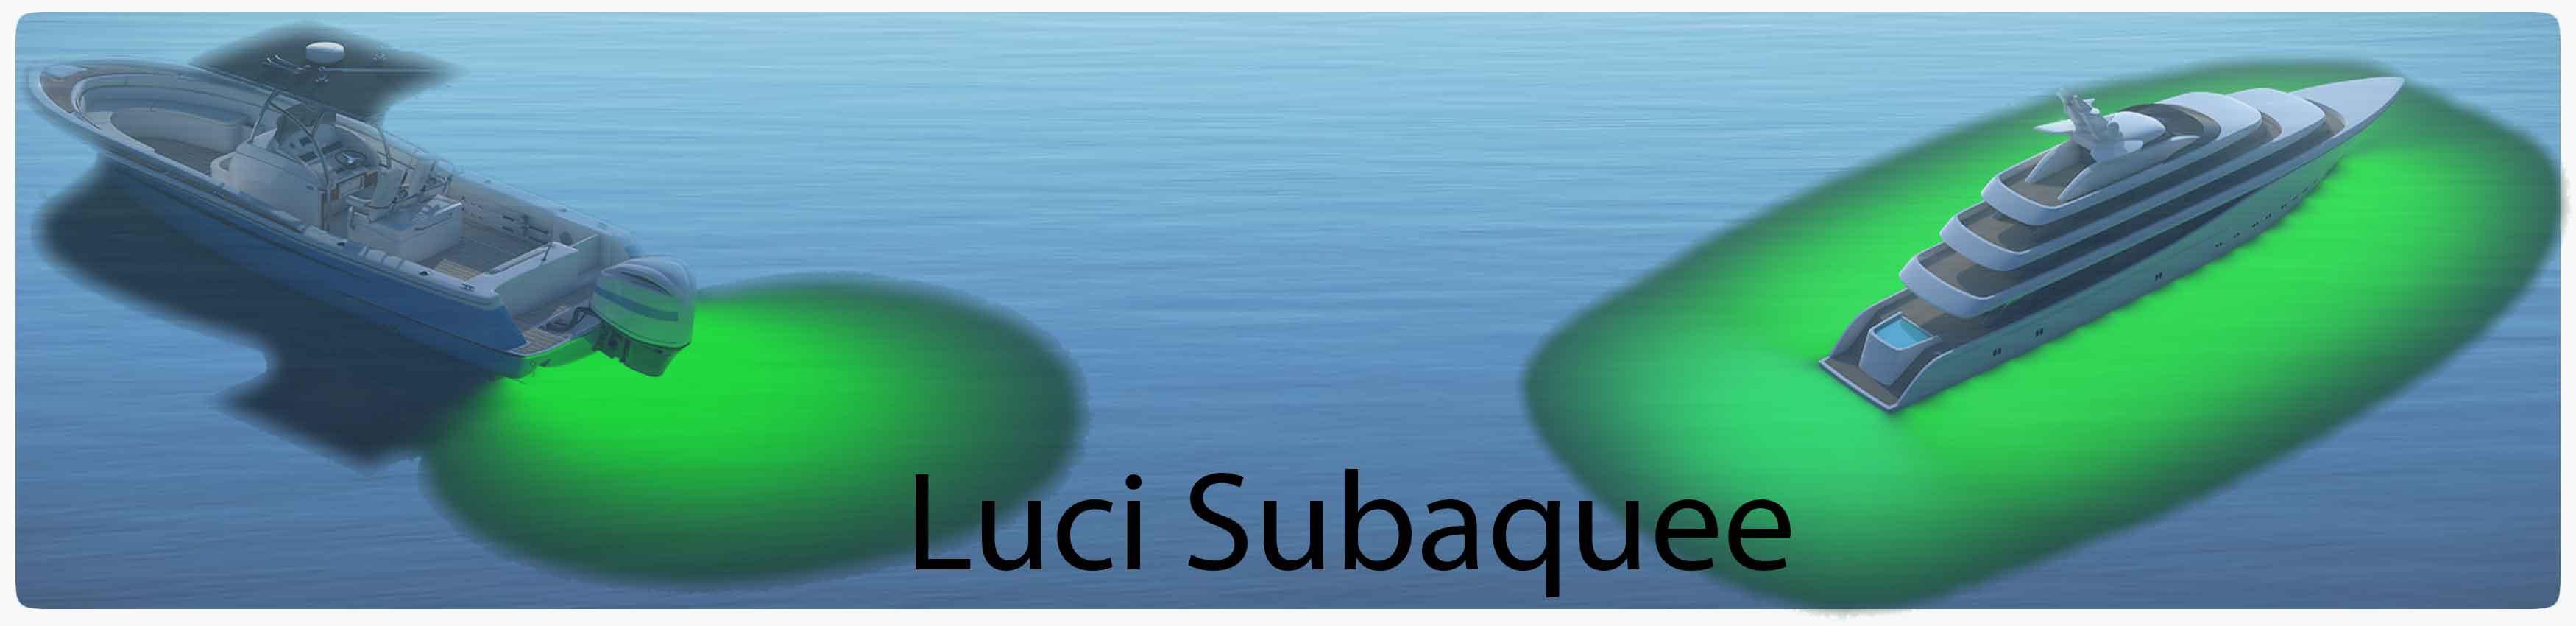 Luci Subaquee